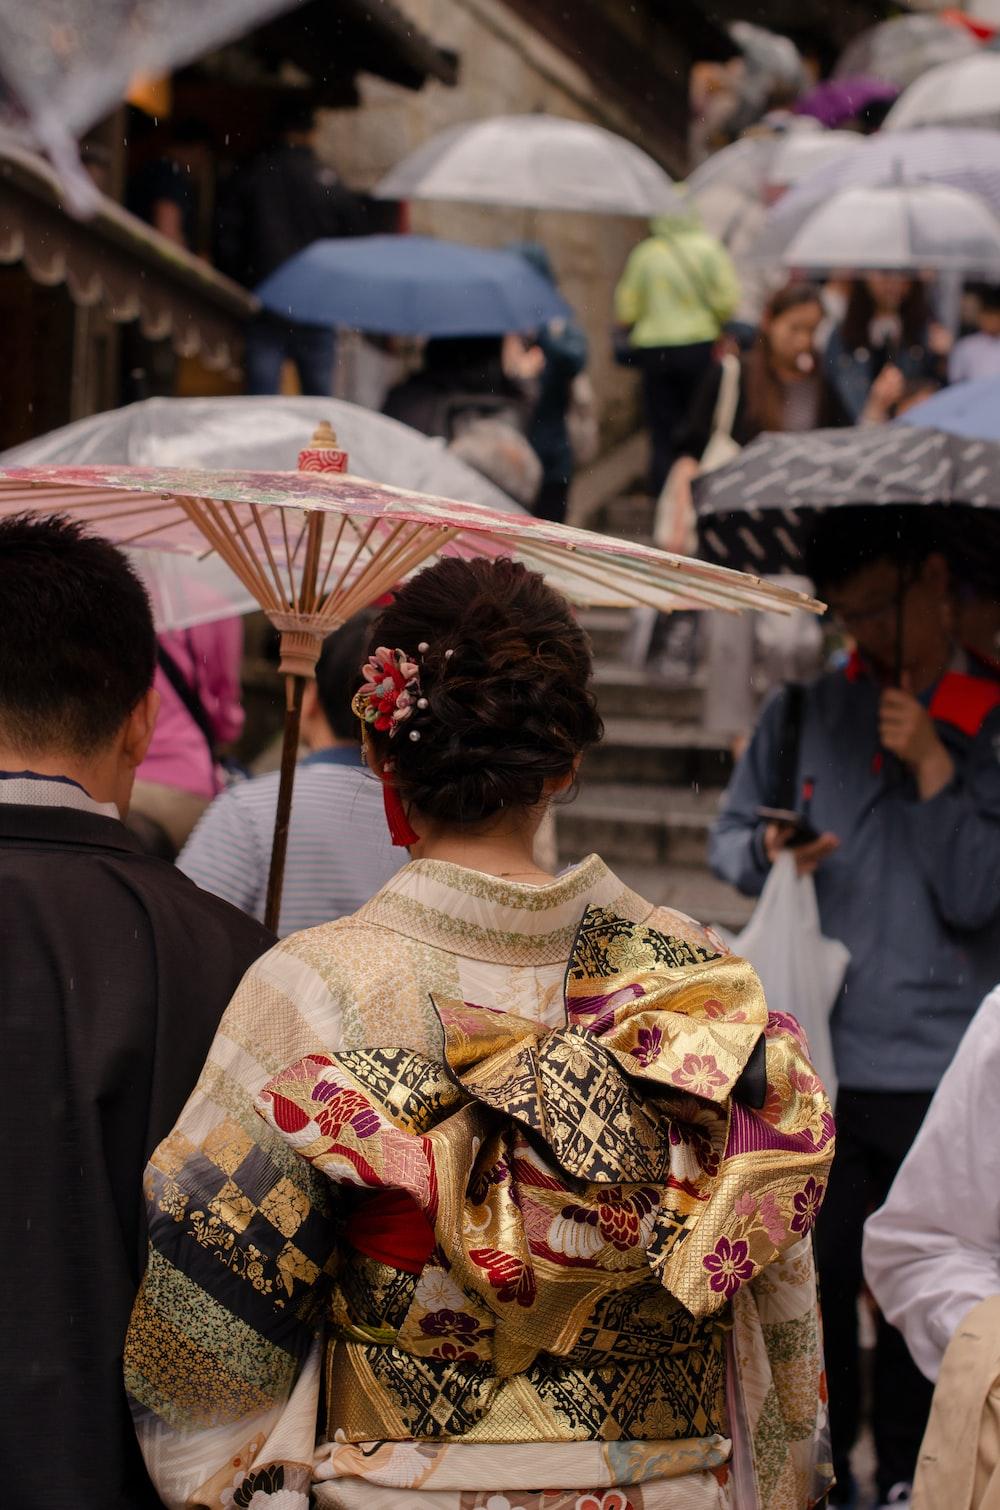 people using umbrellas